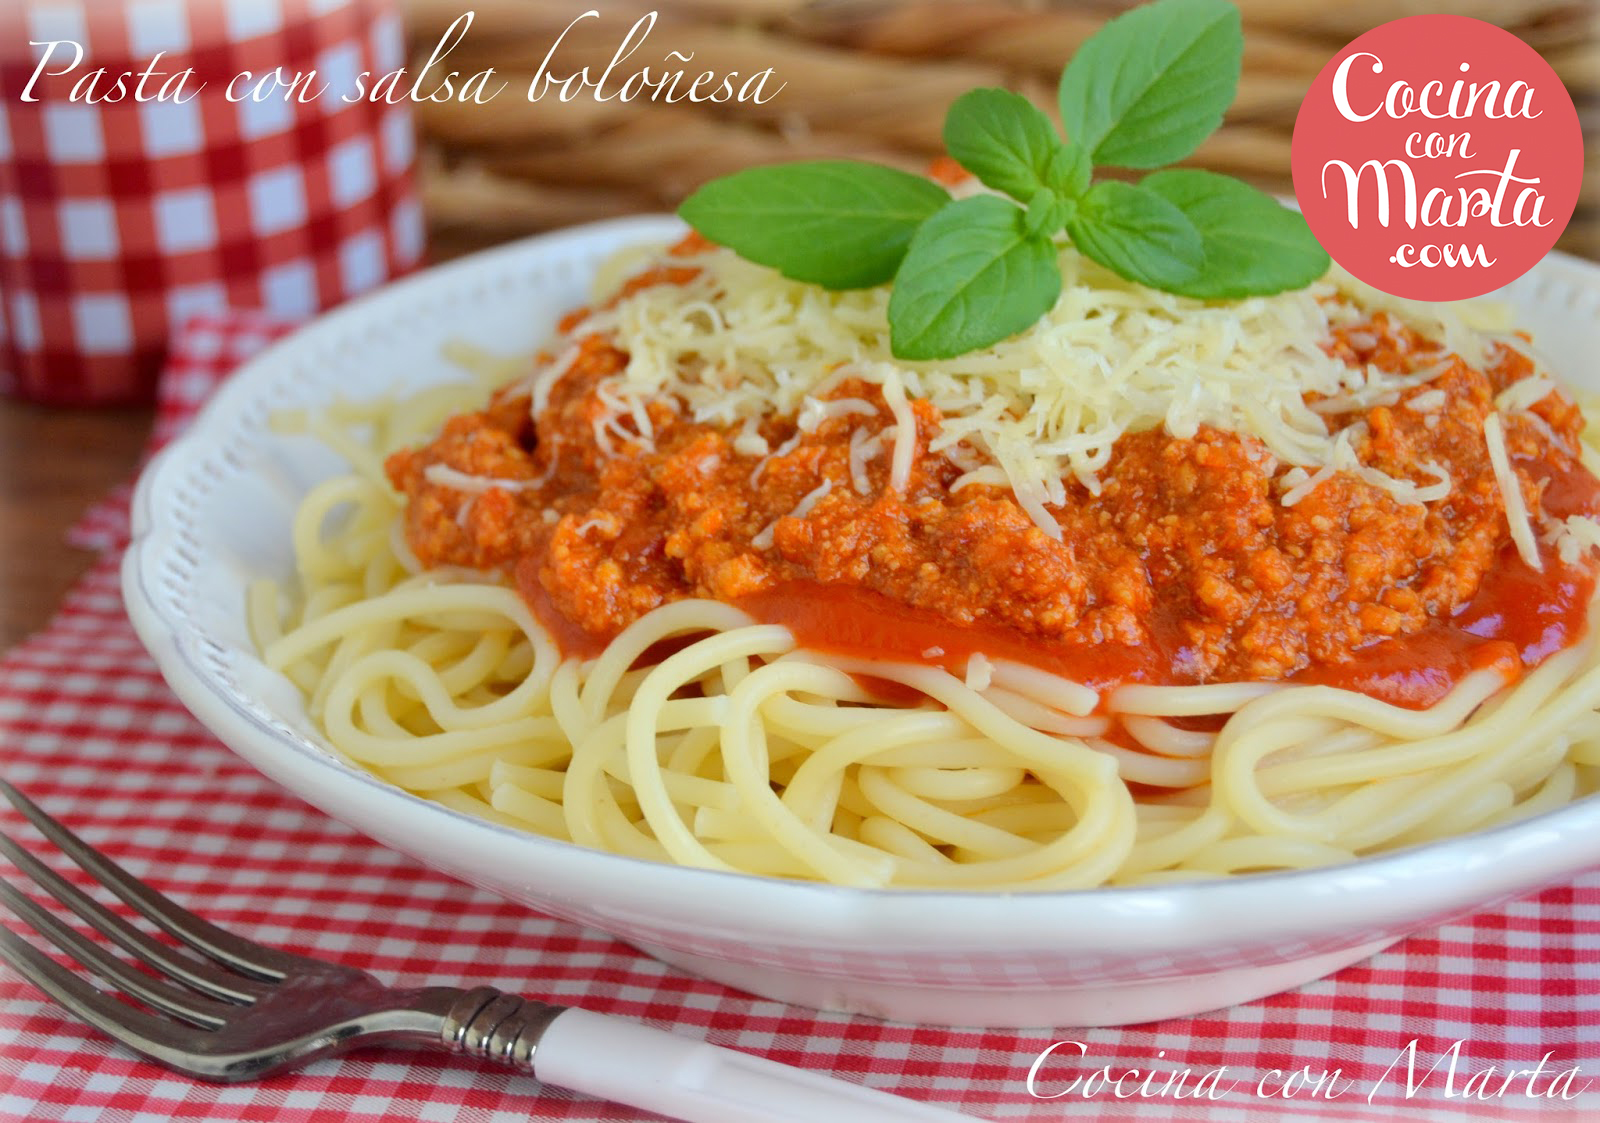 receta, casera, pasta, salsa boloñesa, olla gm, cocina con marta, recetas para niños, fácil, rápido